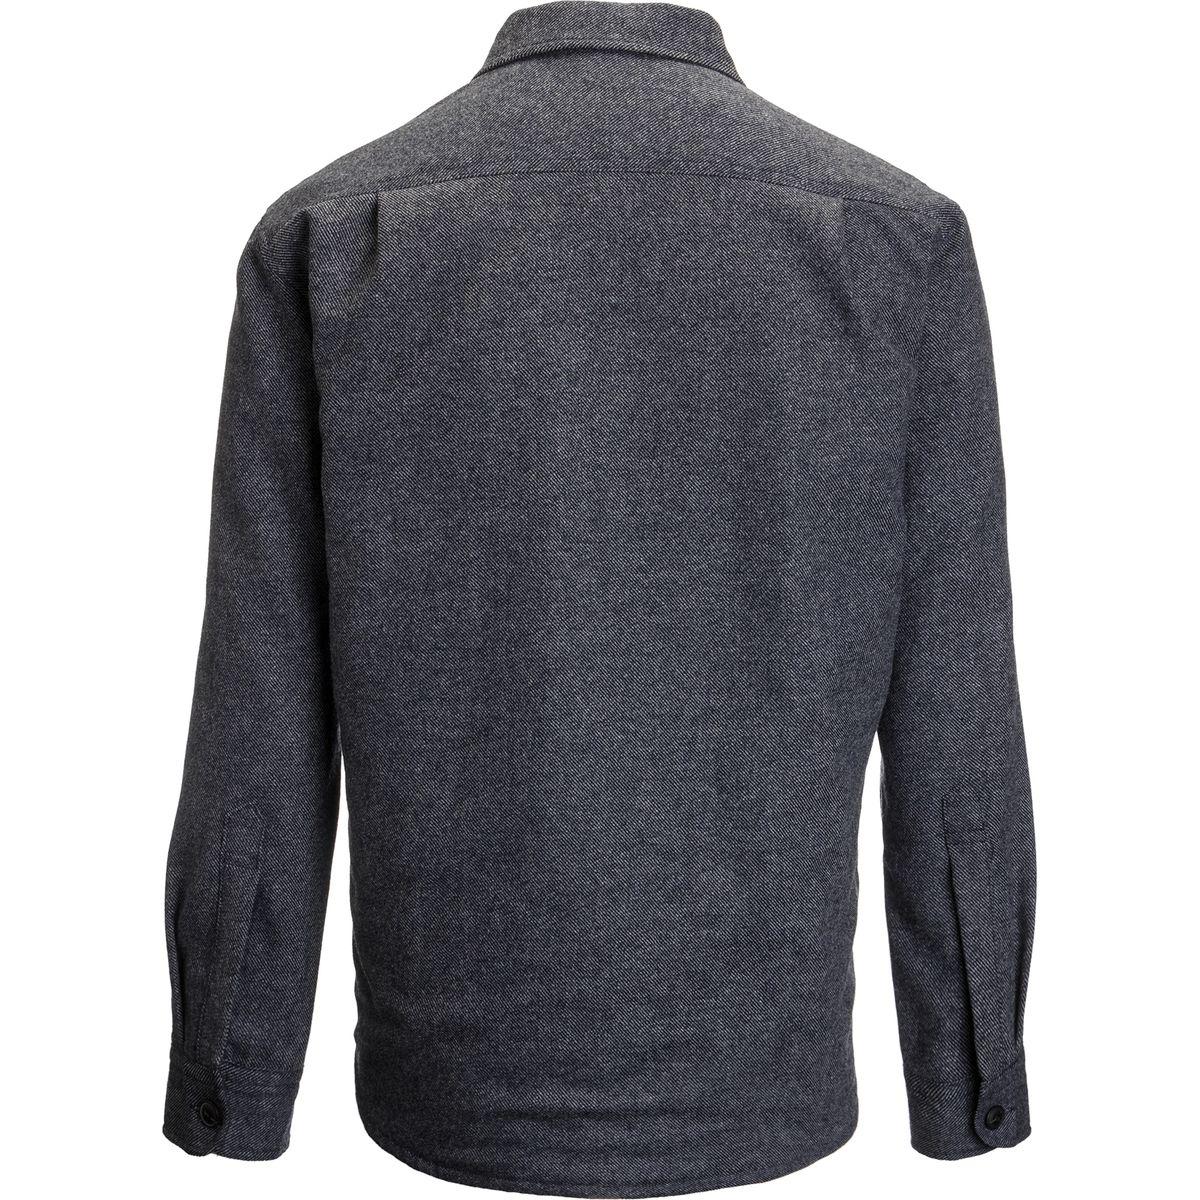 Pendleton Quilted CPO in Wool Shirt Jacket - Men&amp039s | eBay